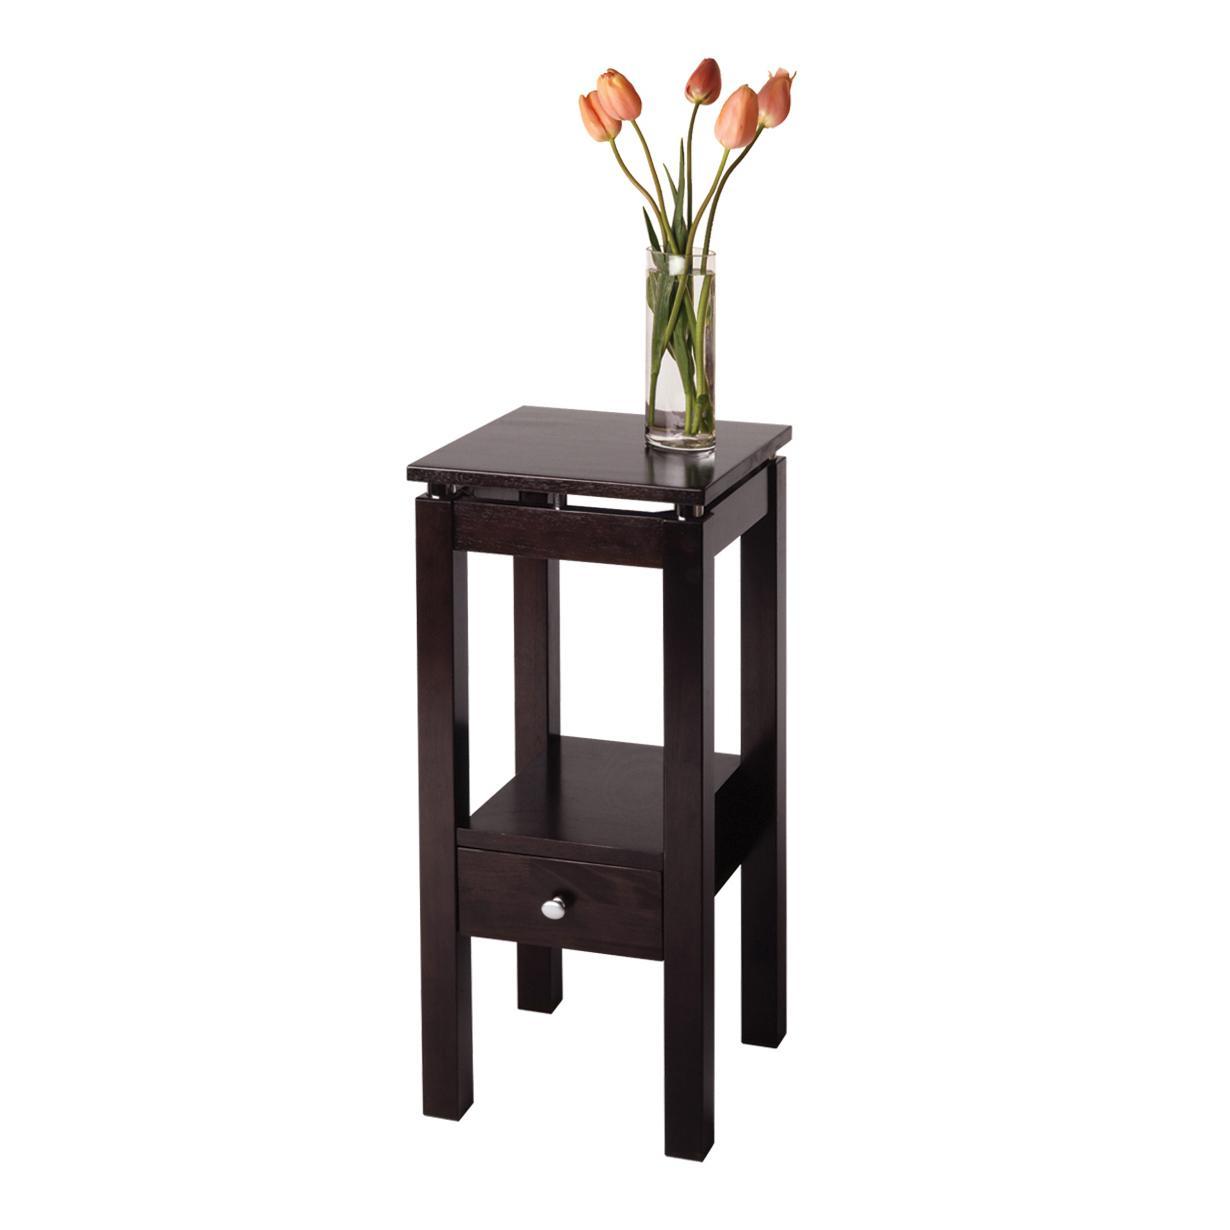 Amazon.com: Winsome Wood Phone Stand, Espresso: Kitchen